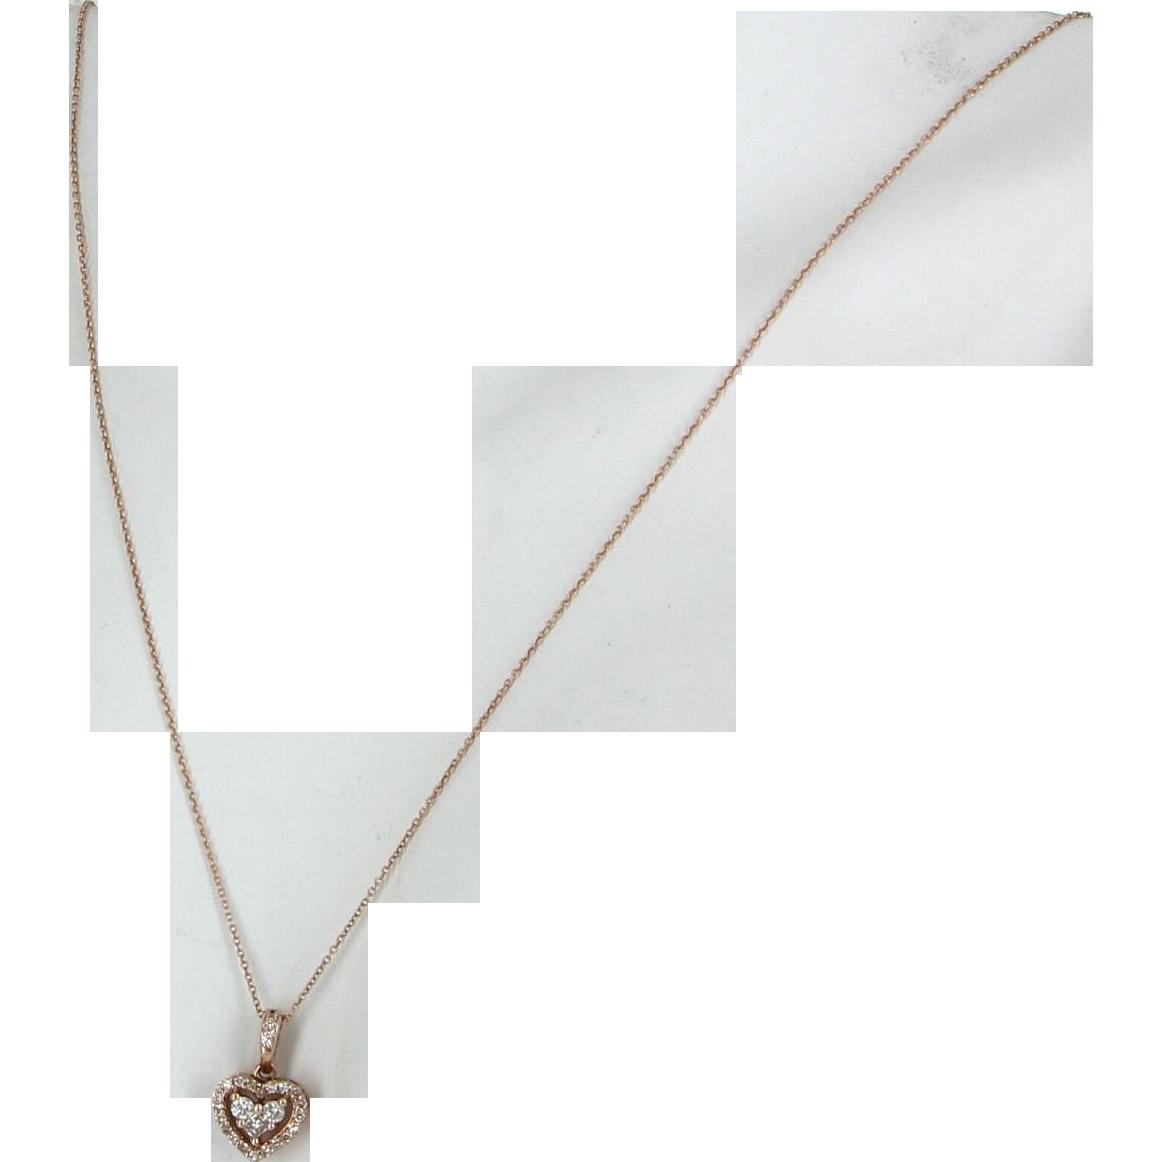 Diamond Heart Pendant Necklace Vintage 14 Karat Rose Gold Estate Fine Jewelry